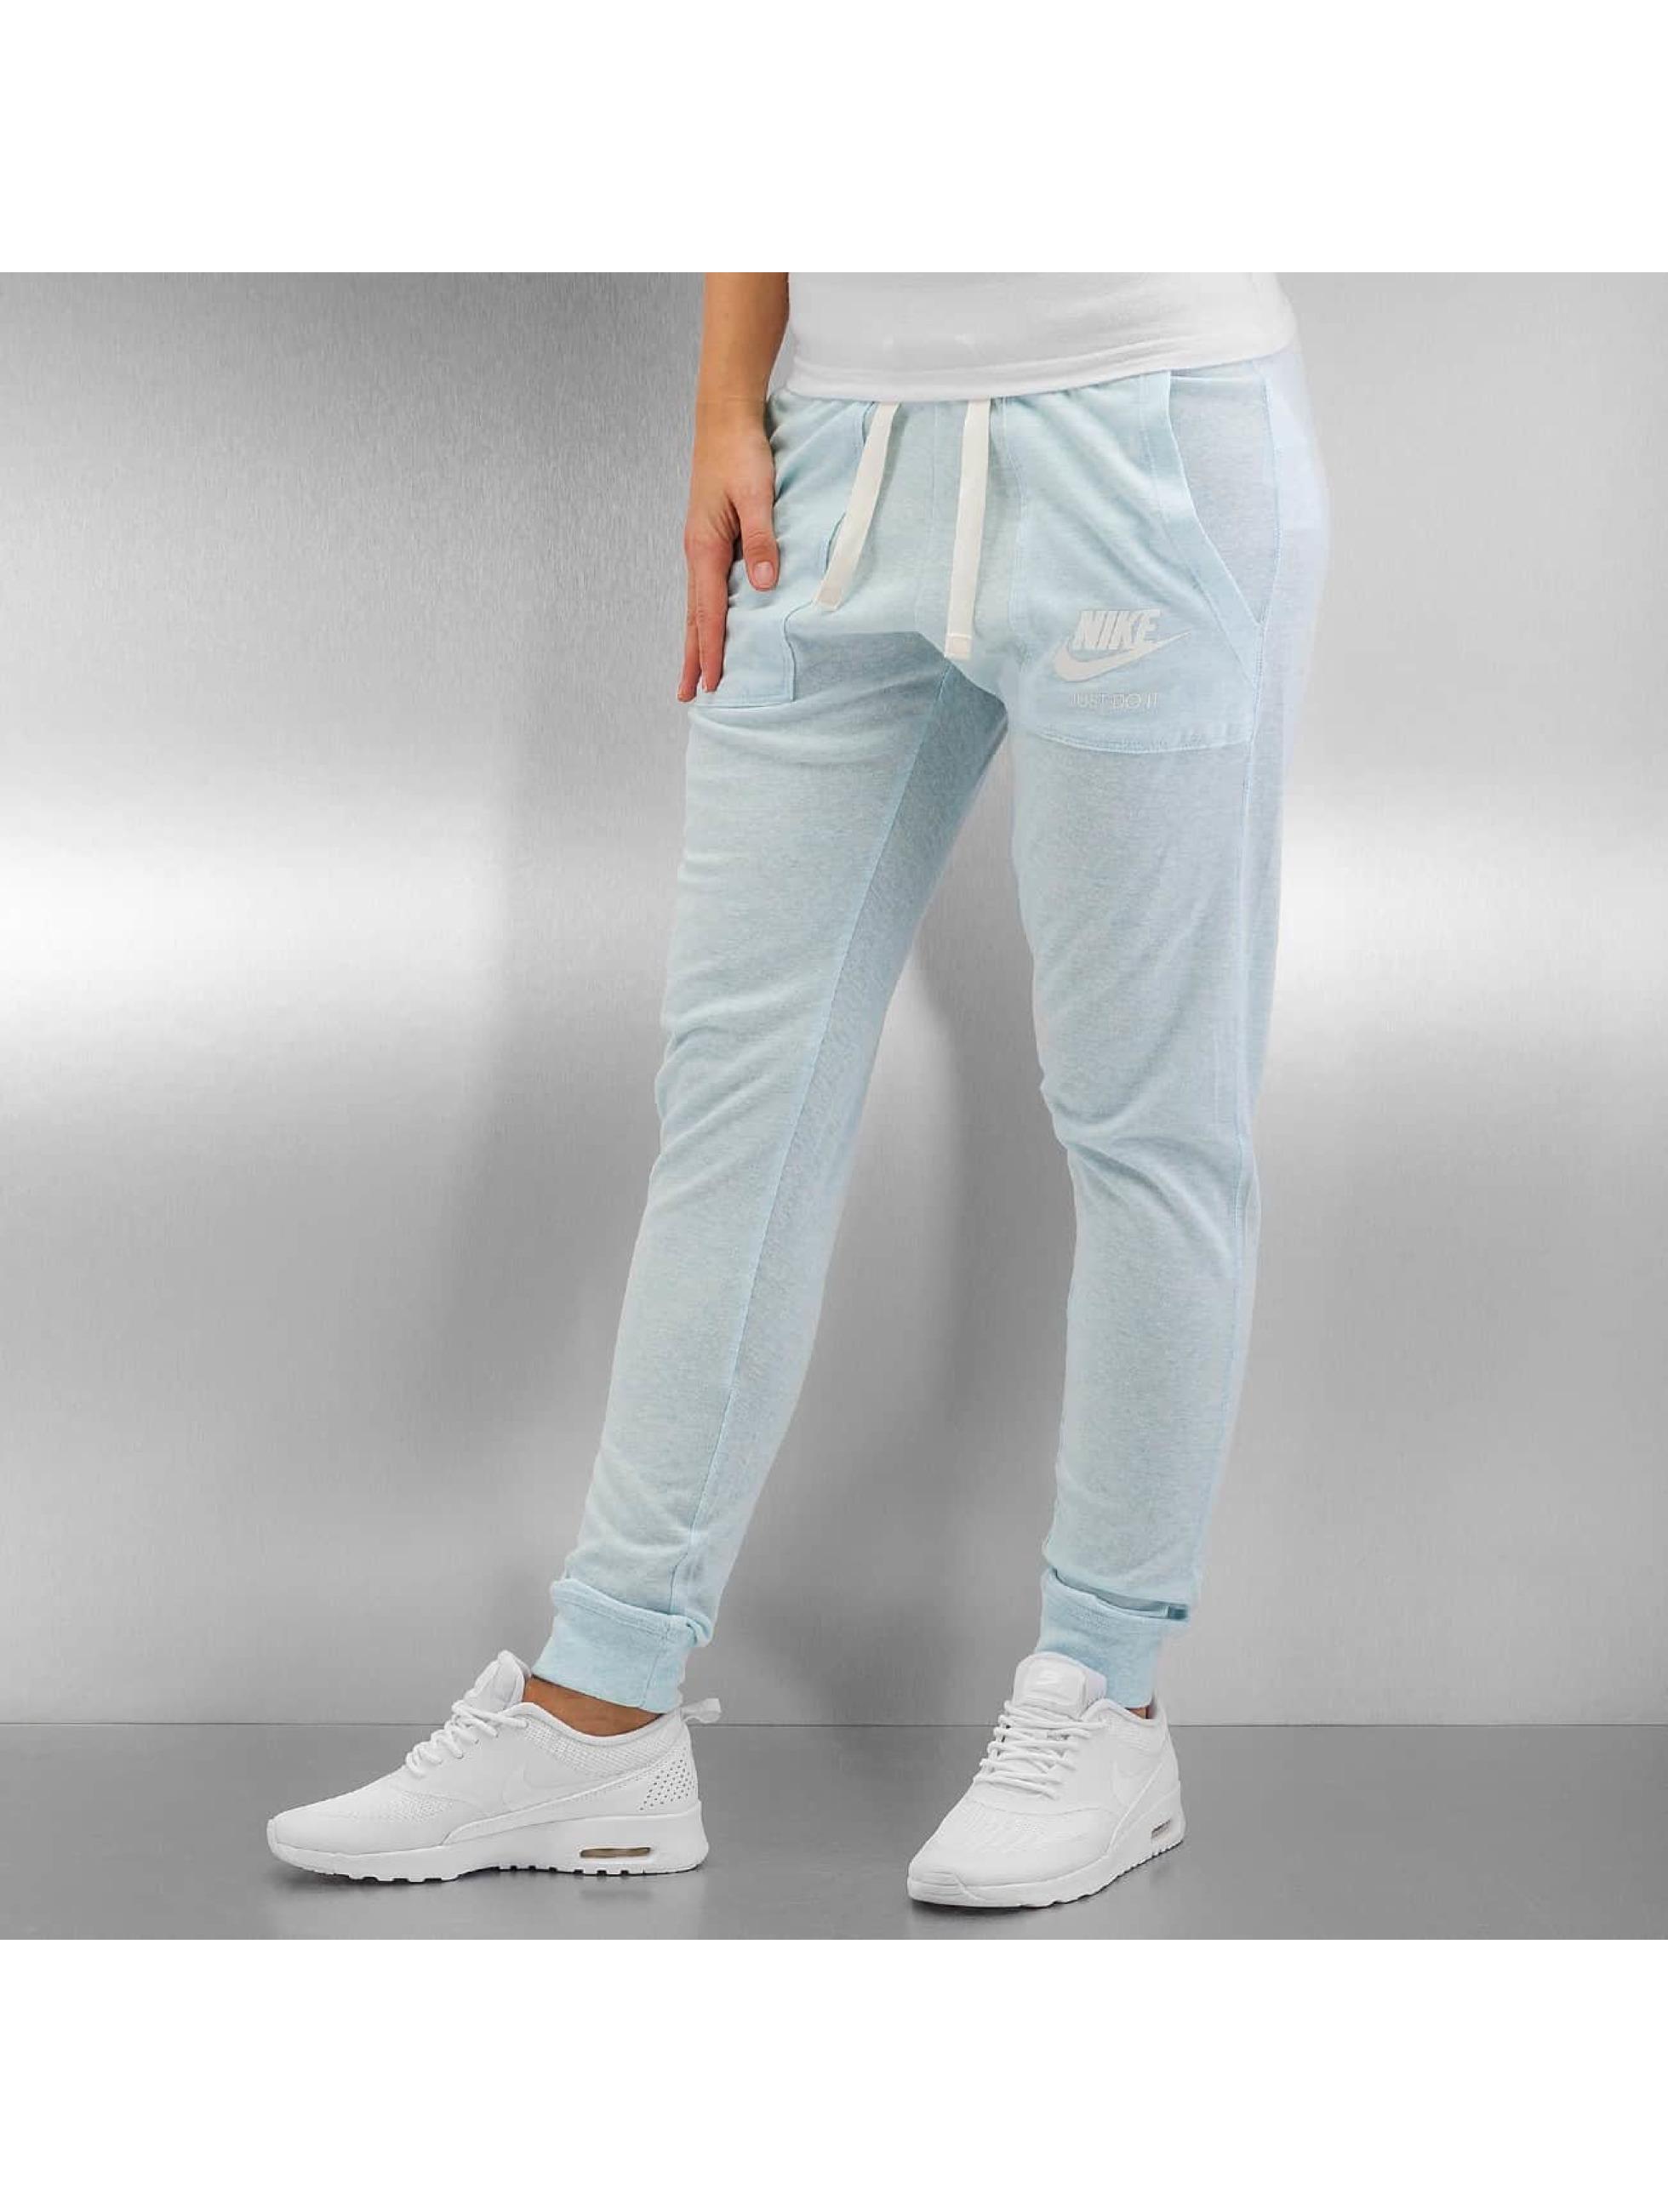 Nike Frauen Jogginghose Gym Vintage in blau